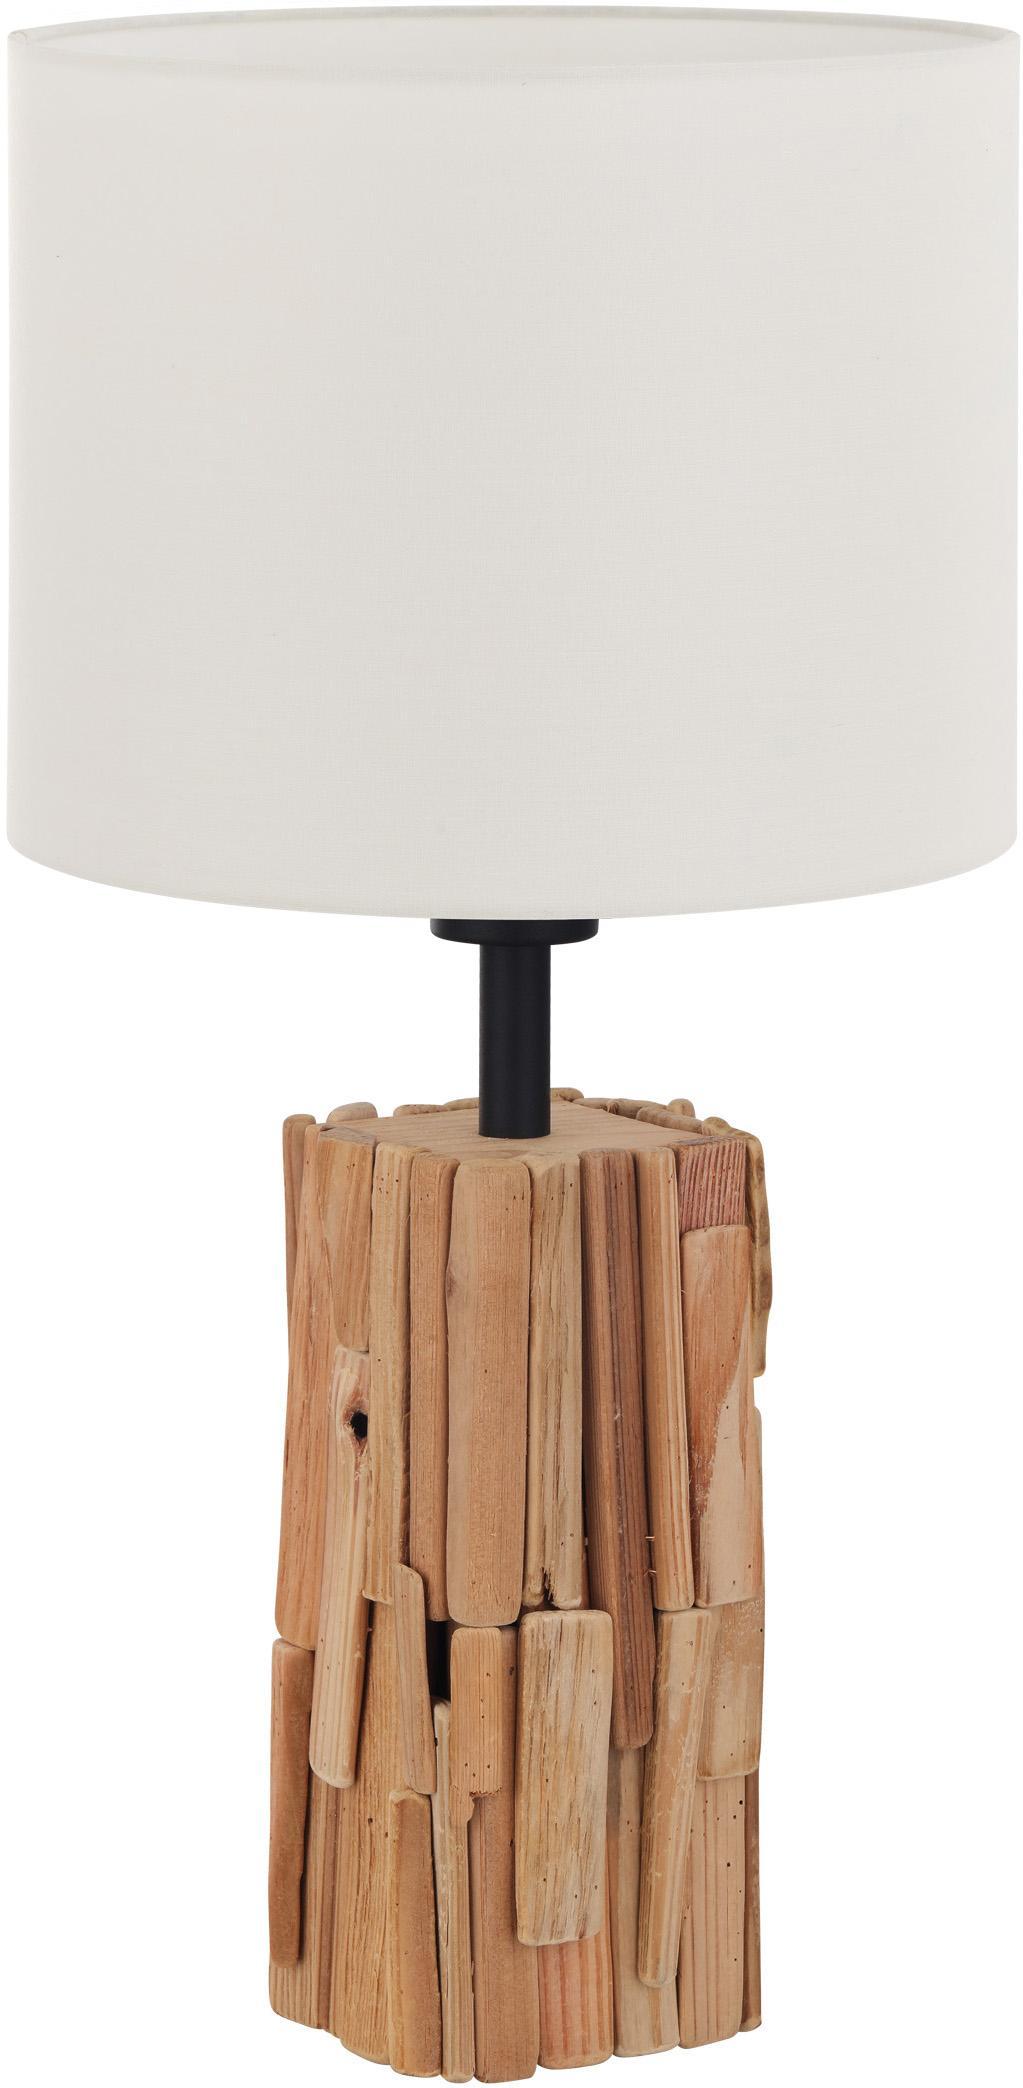 Tafellamp Portishead met houten voet, Lampenkap: linnen, Lampvoet: hout, Bruin, wit, Ø 26 cm